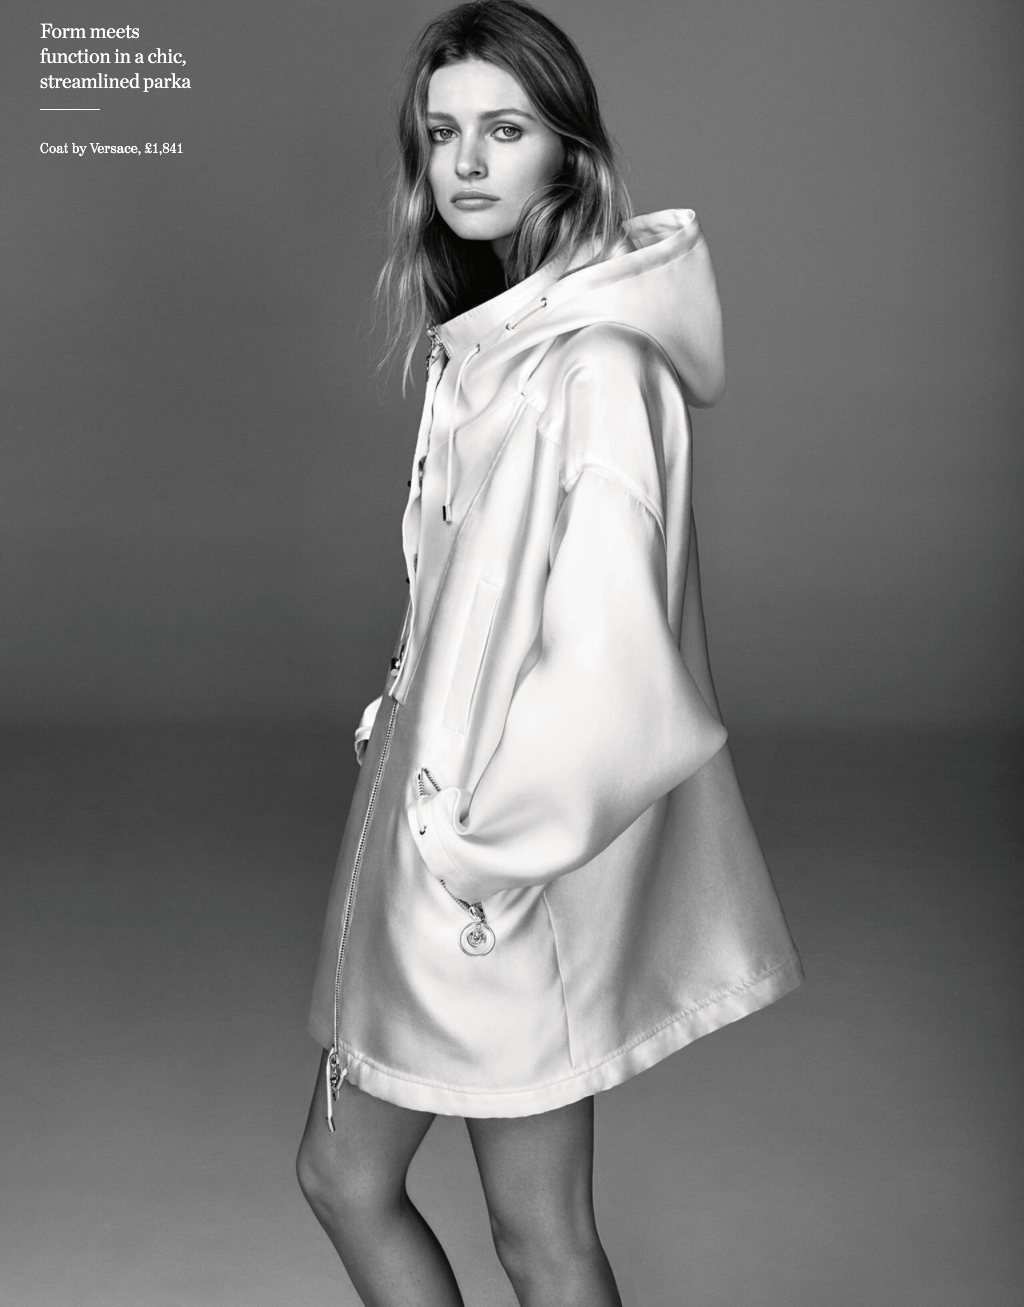 Edita Vilkeviciute by Erik Torstensson for Porter Magazine